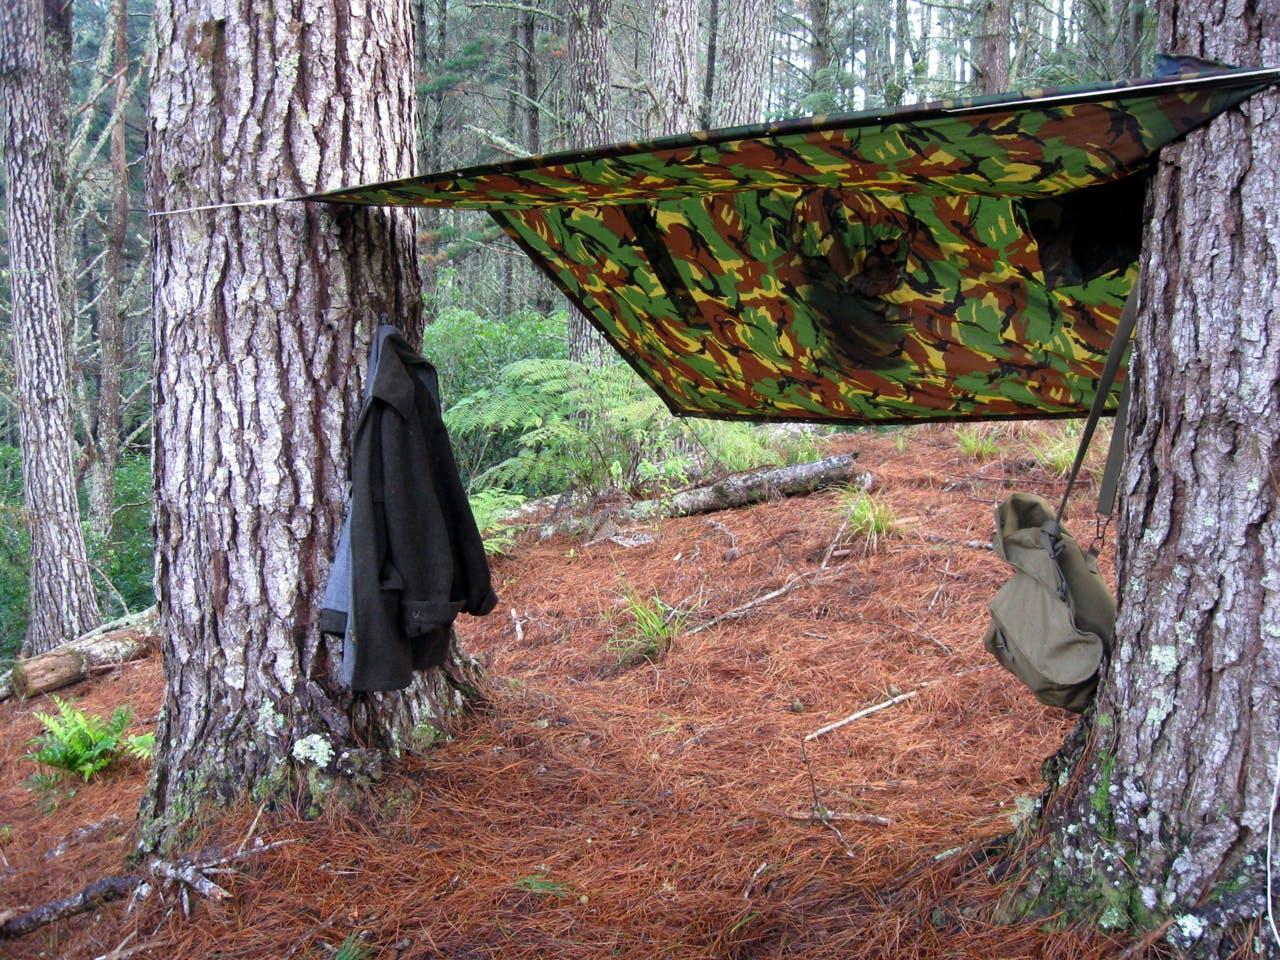 Josh built a shelter with a fire an arm's distance away. Photo: Josh Gale